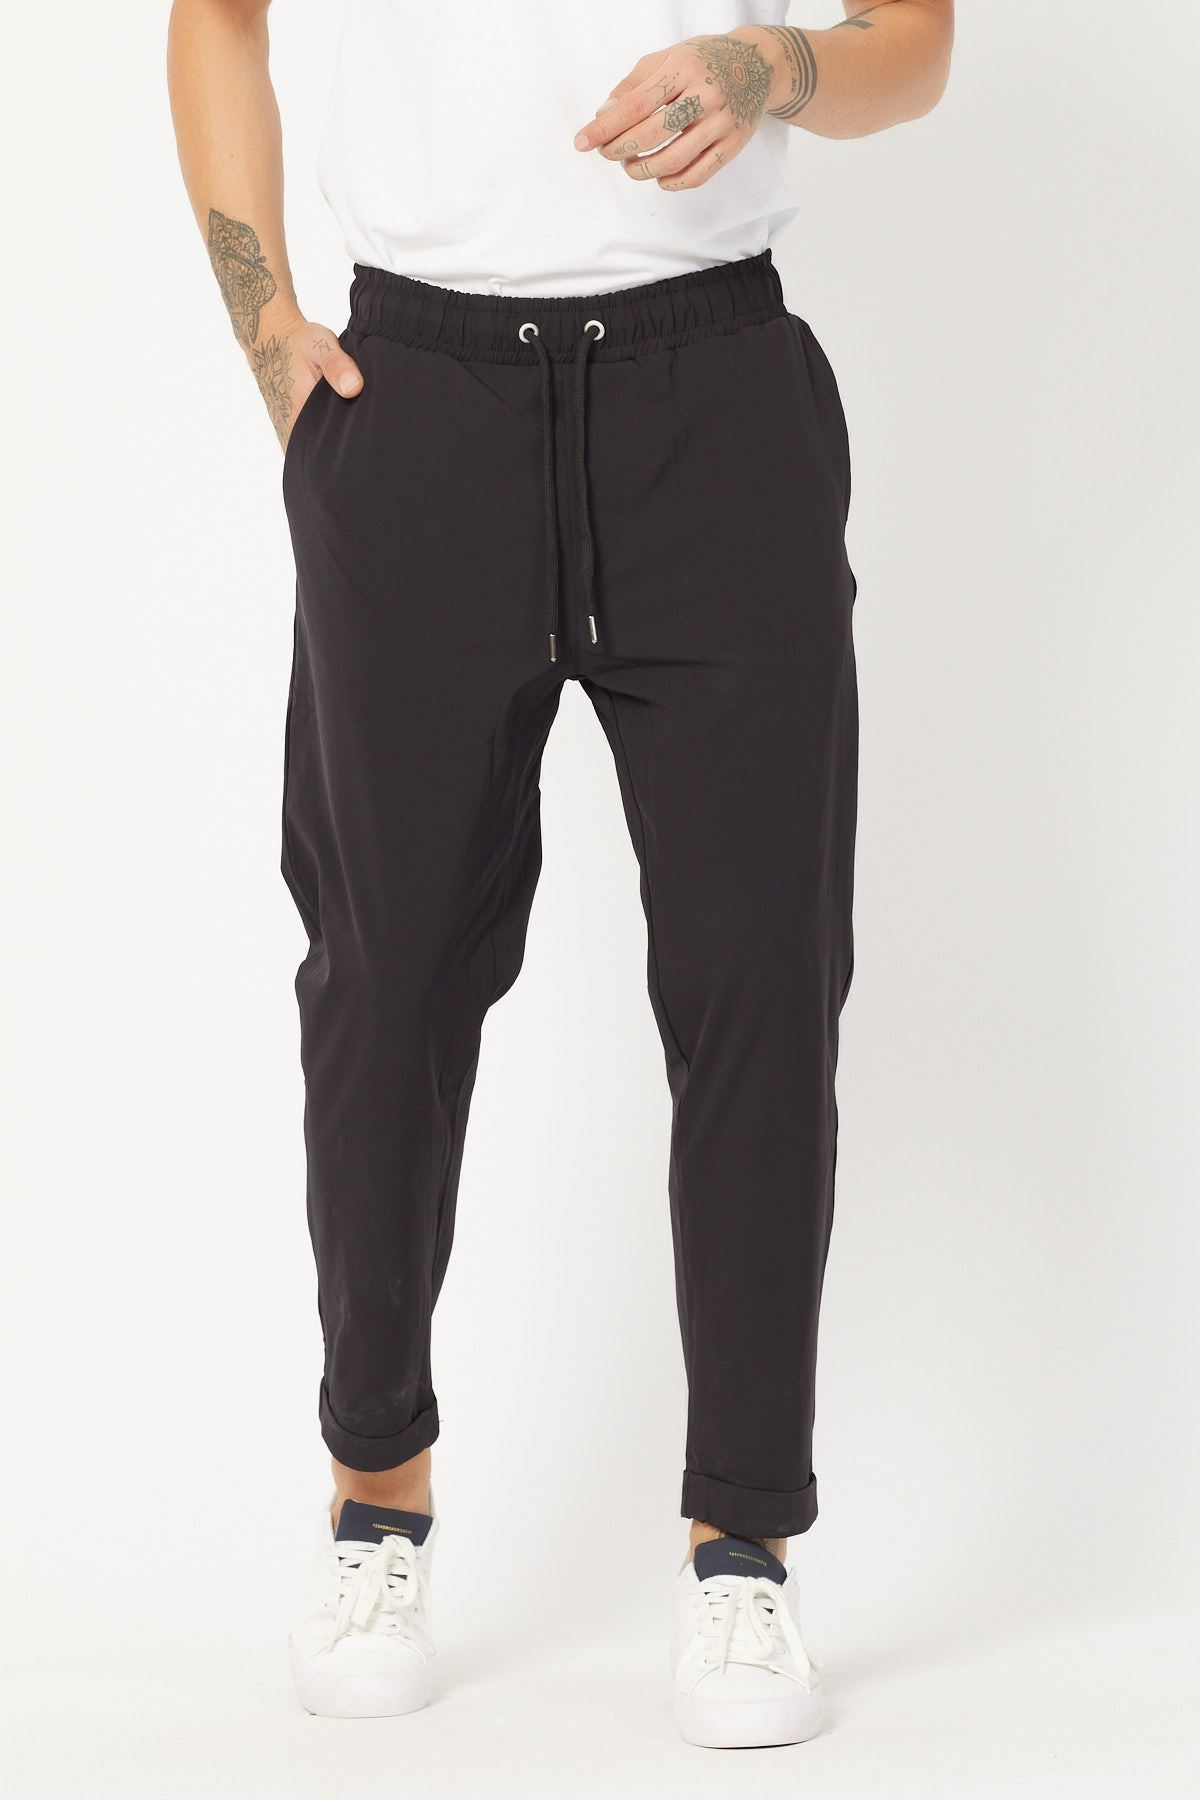 Beli Lastikli Dar Kesim Kumaş Pantolon